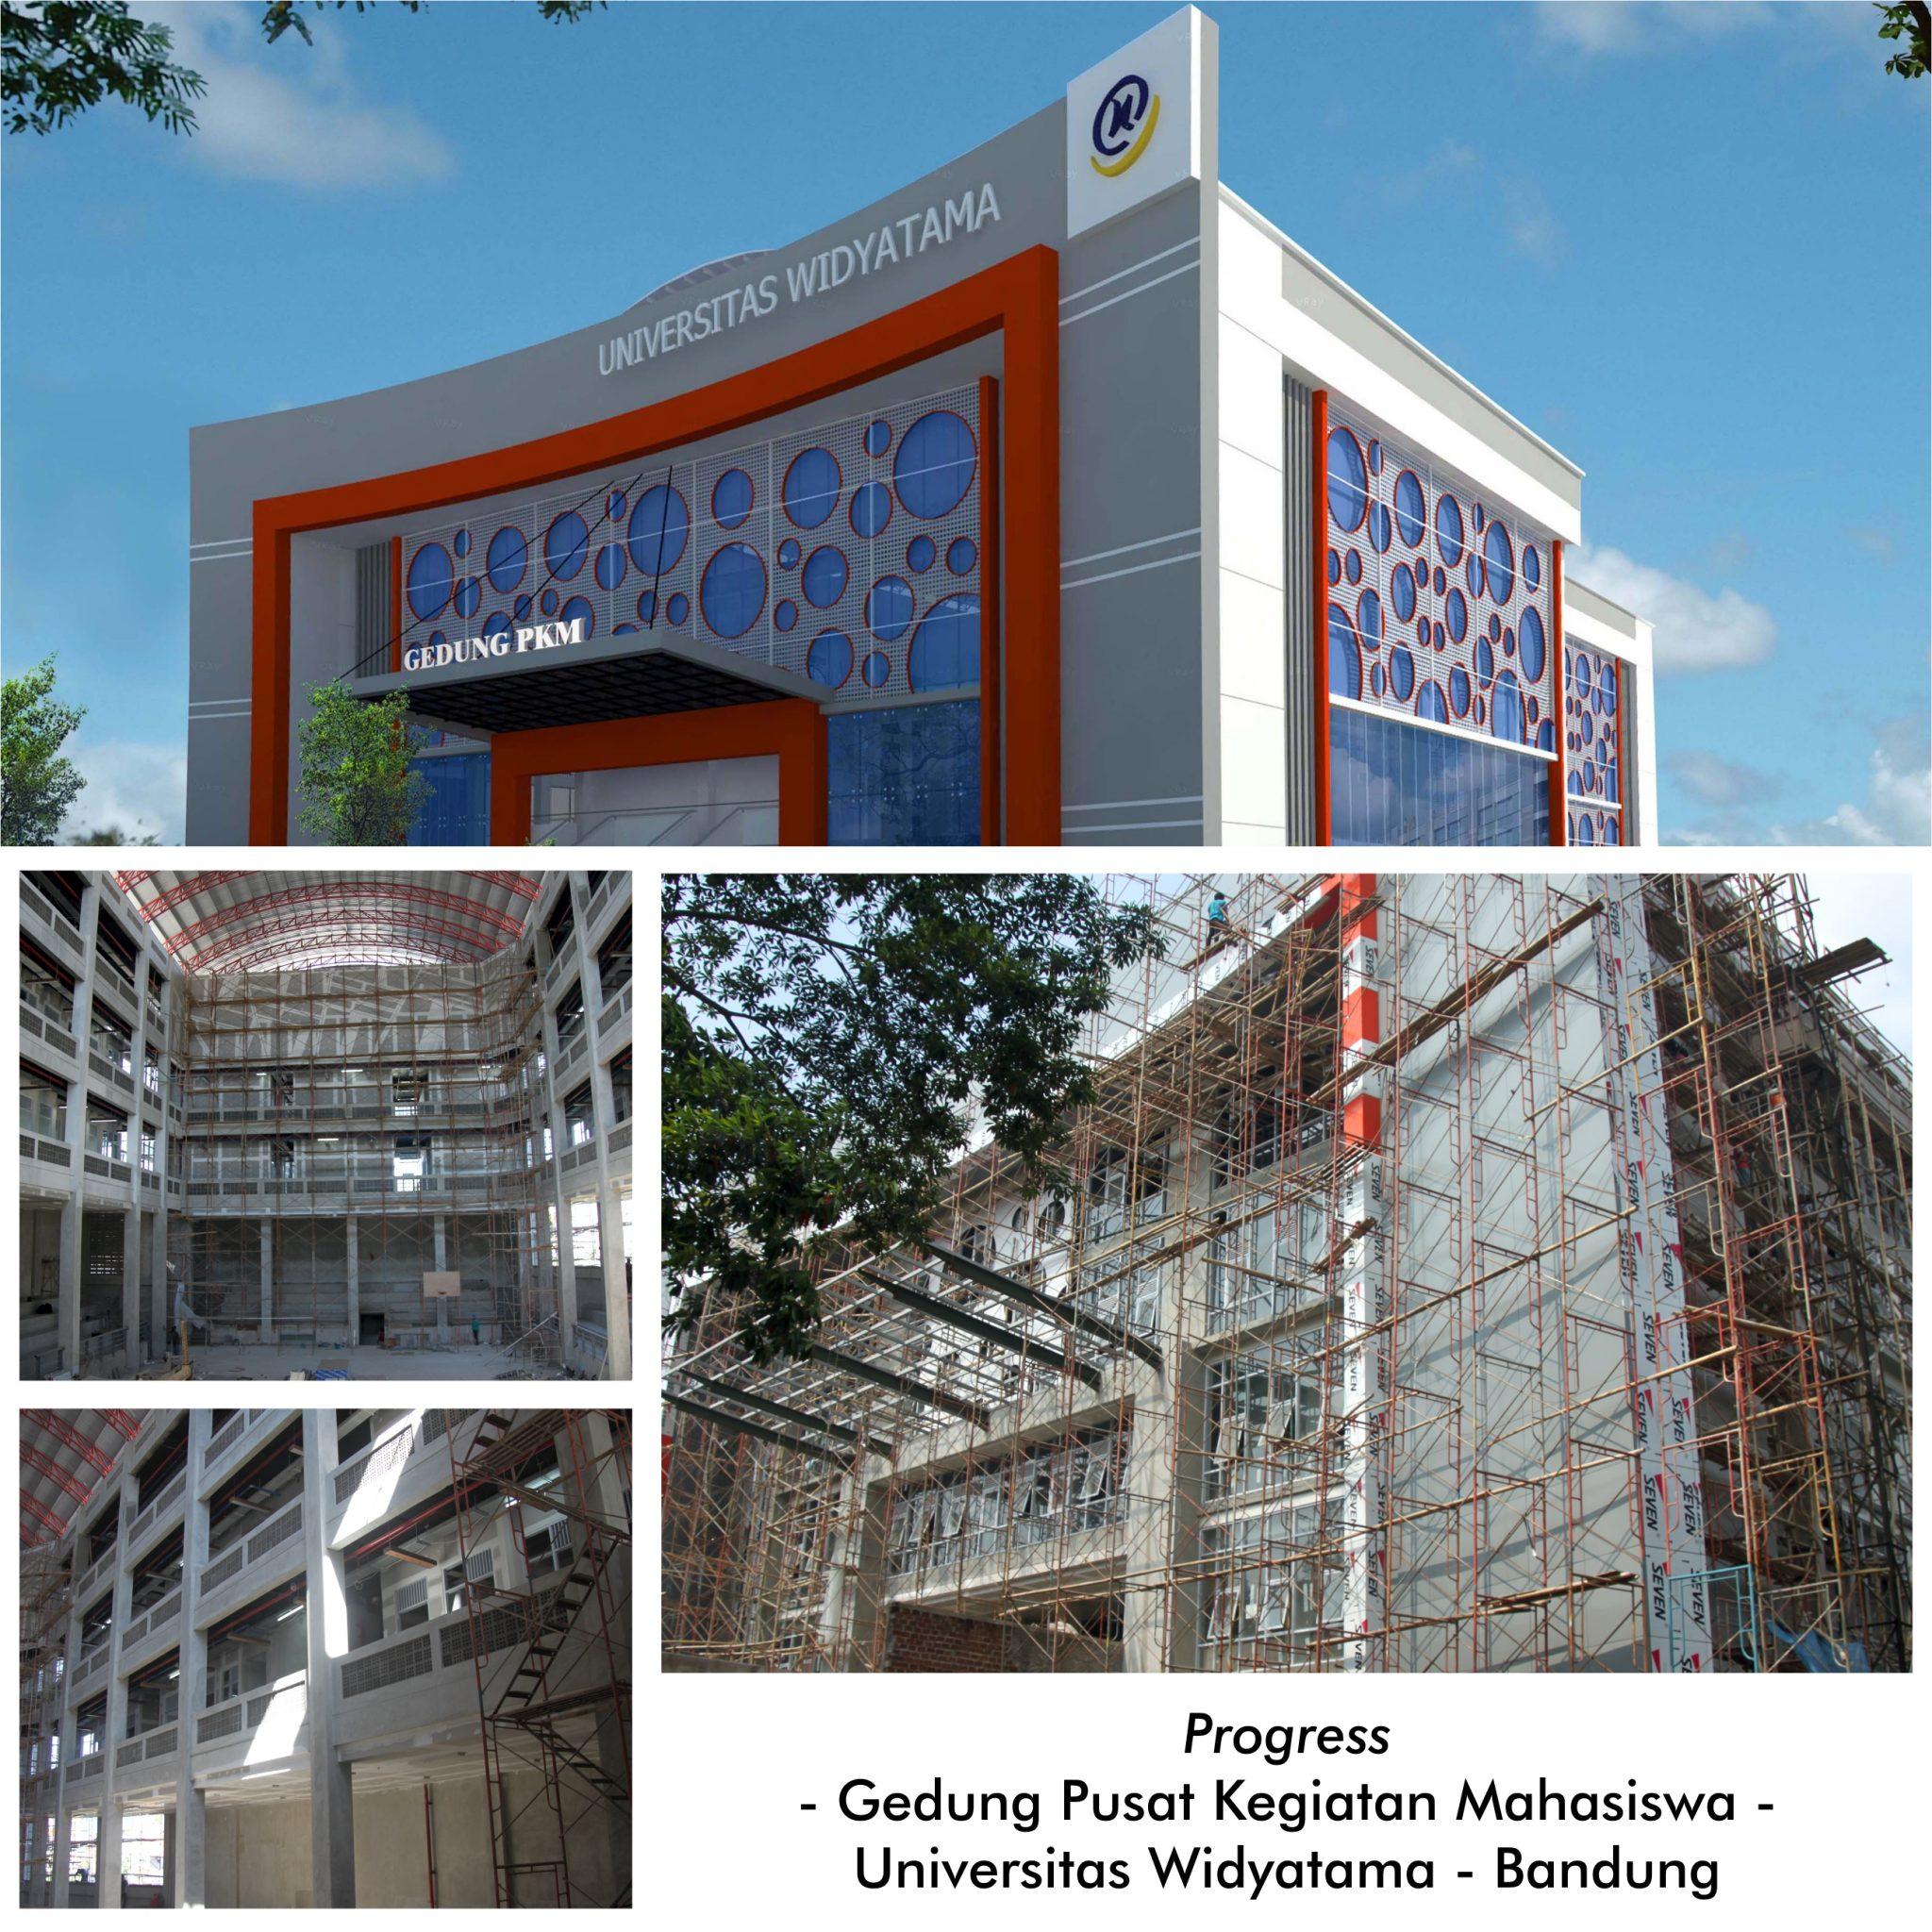 Gedung PKM Sarana Mengasah Potensi Mahasiswa Universitas Widyatama